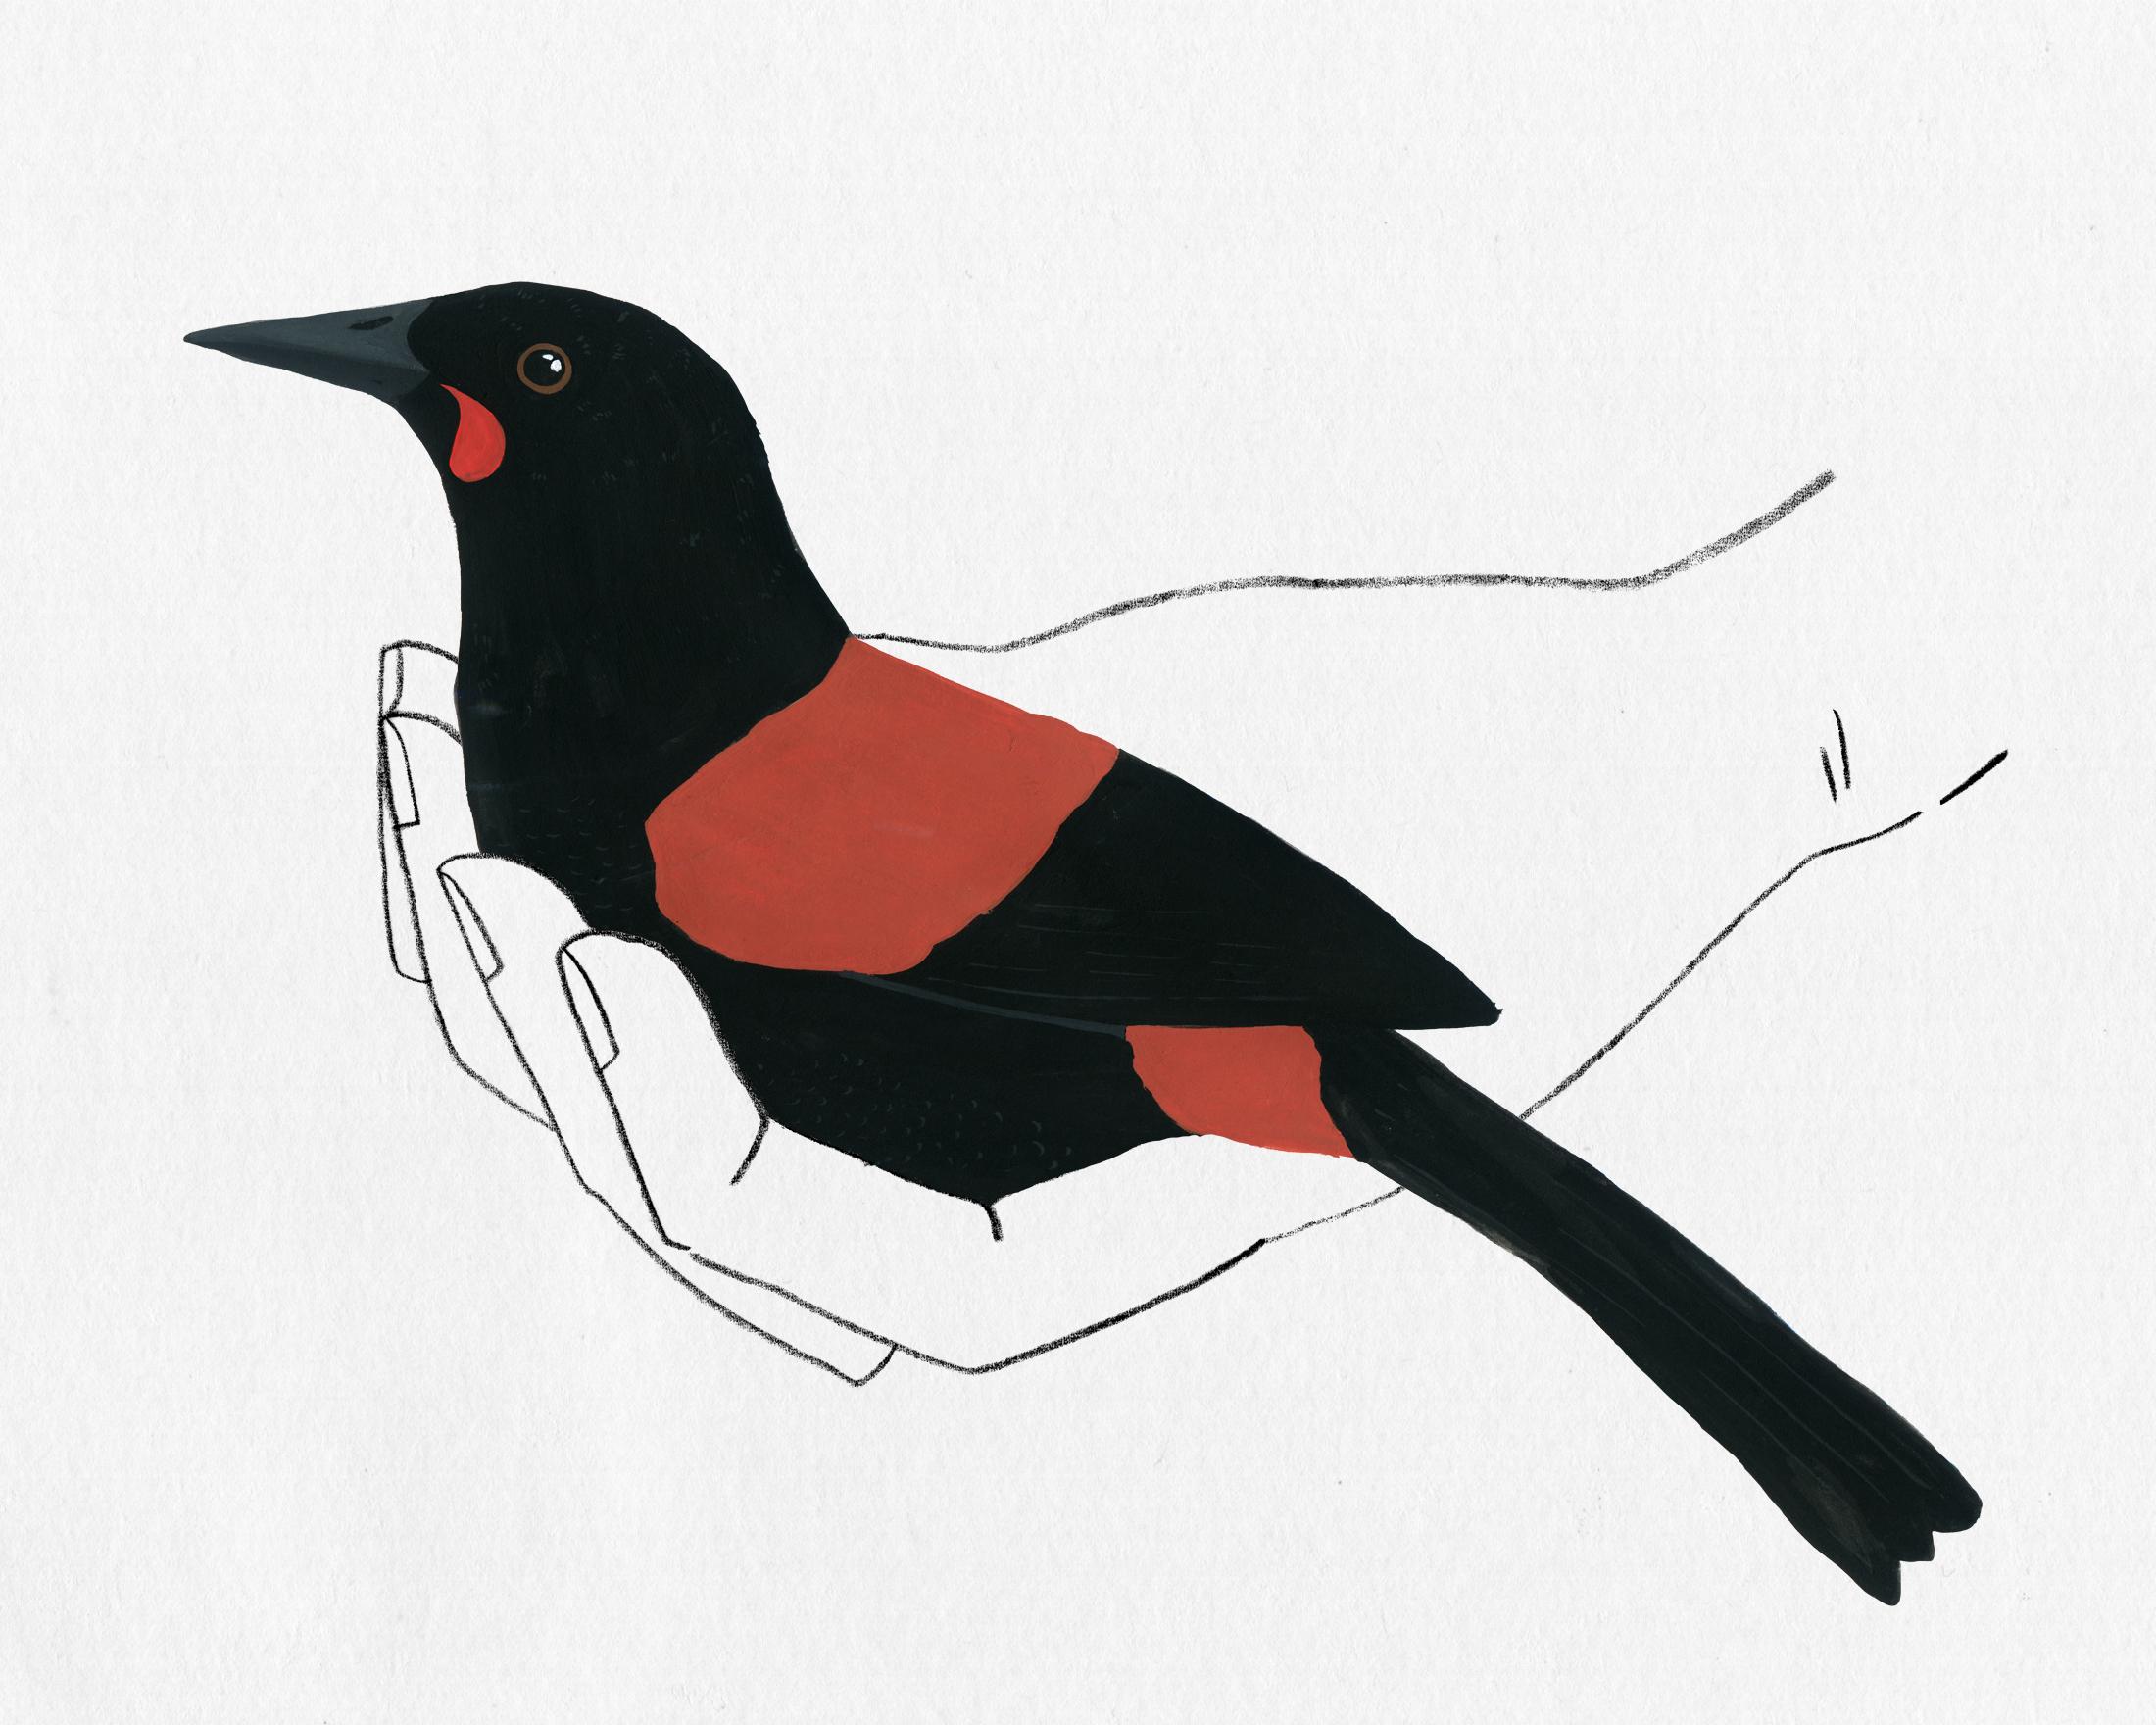 bird in hand series - saddleback